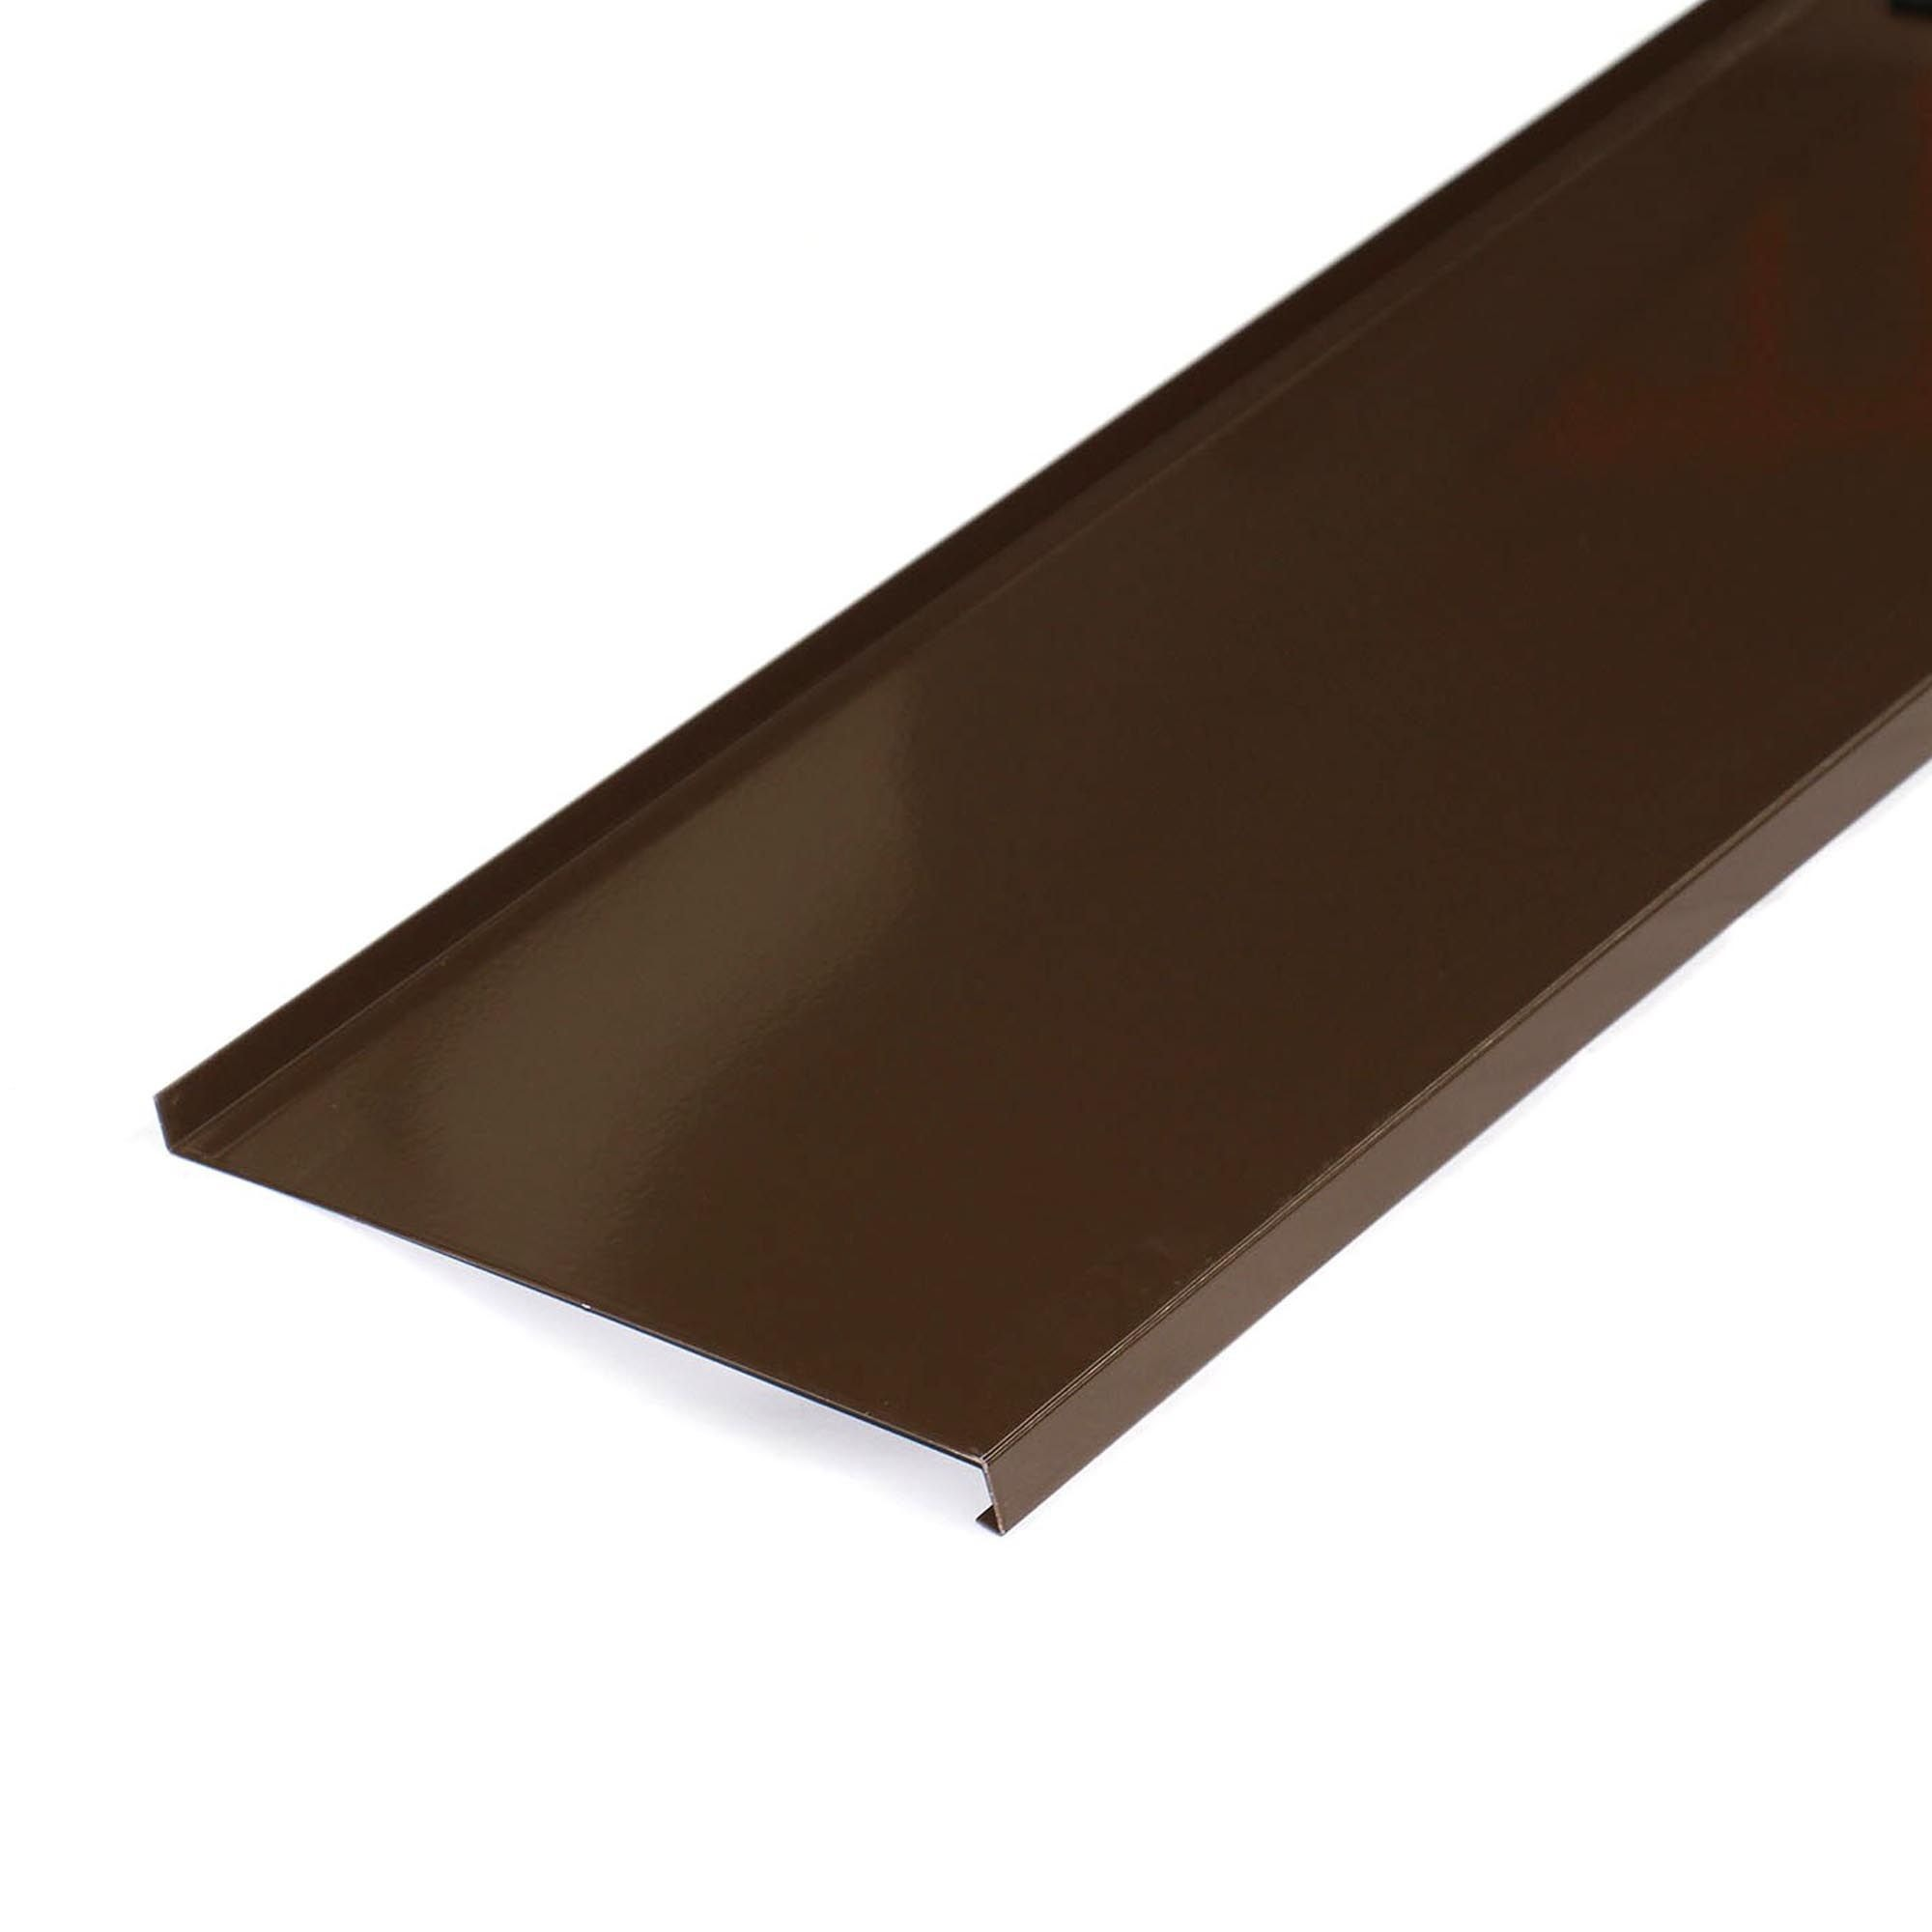 Glaf din aluminiu, maro ciocolatiu mat RAL 8017, 300 x 24 cm imagine MatHaus.ro